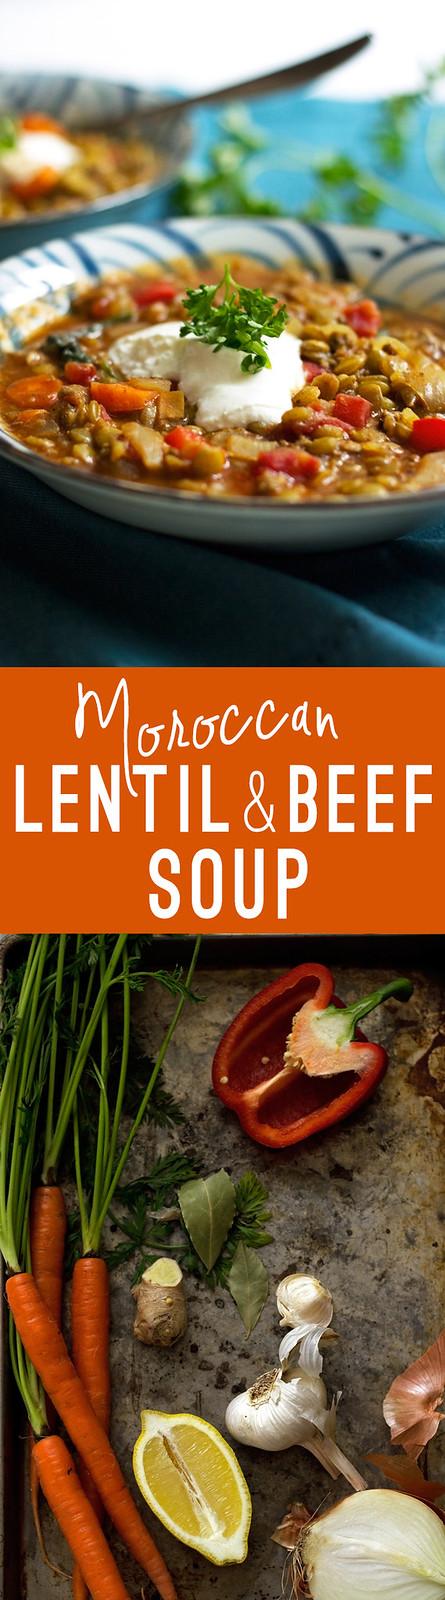 Moroccan-Soup-Pinterest